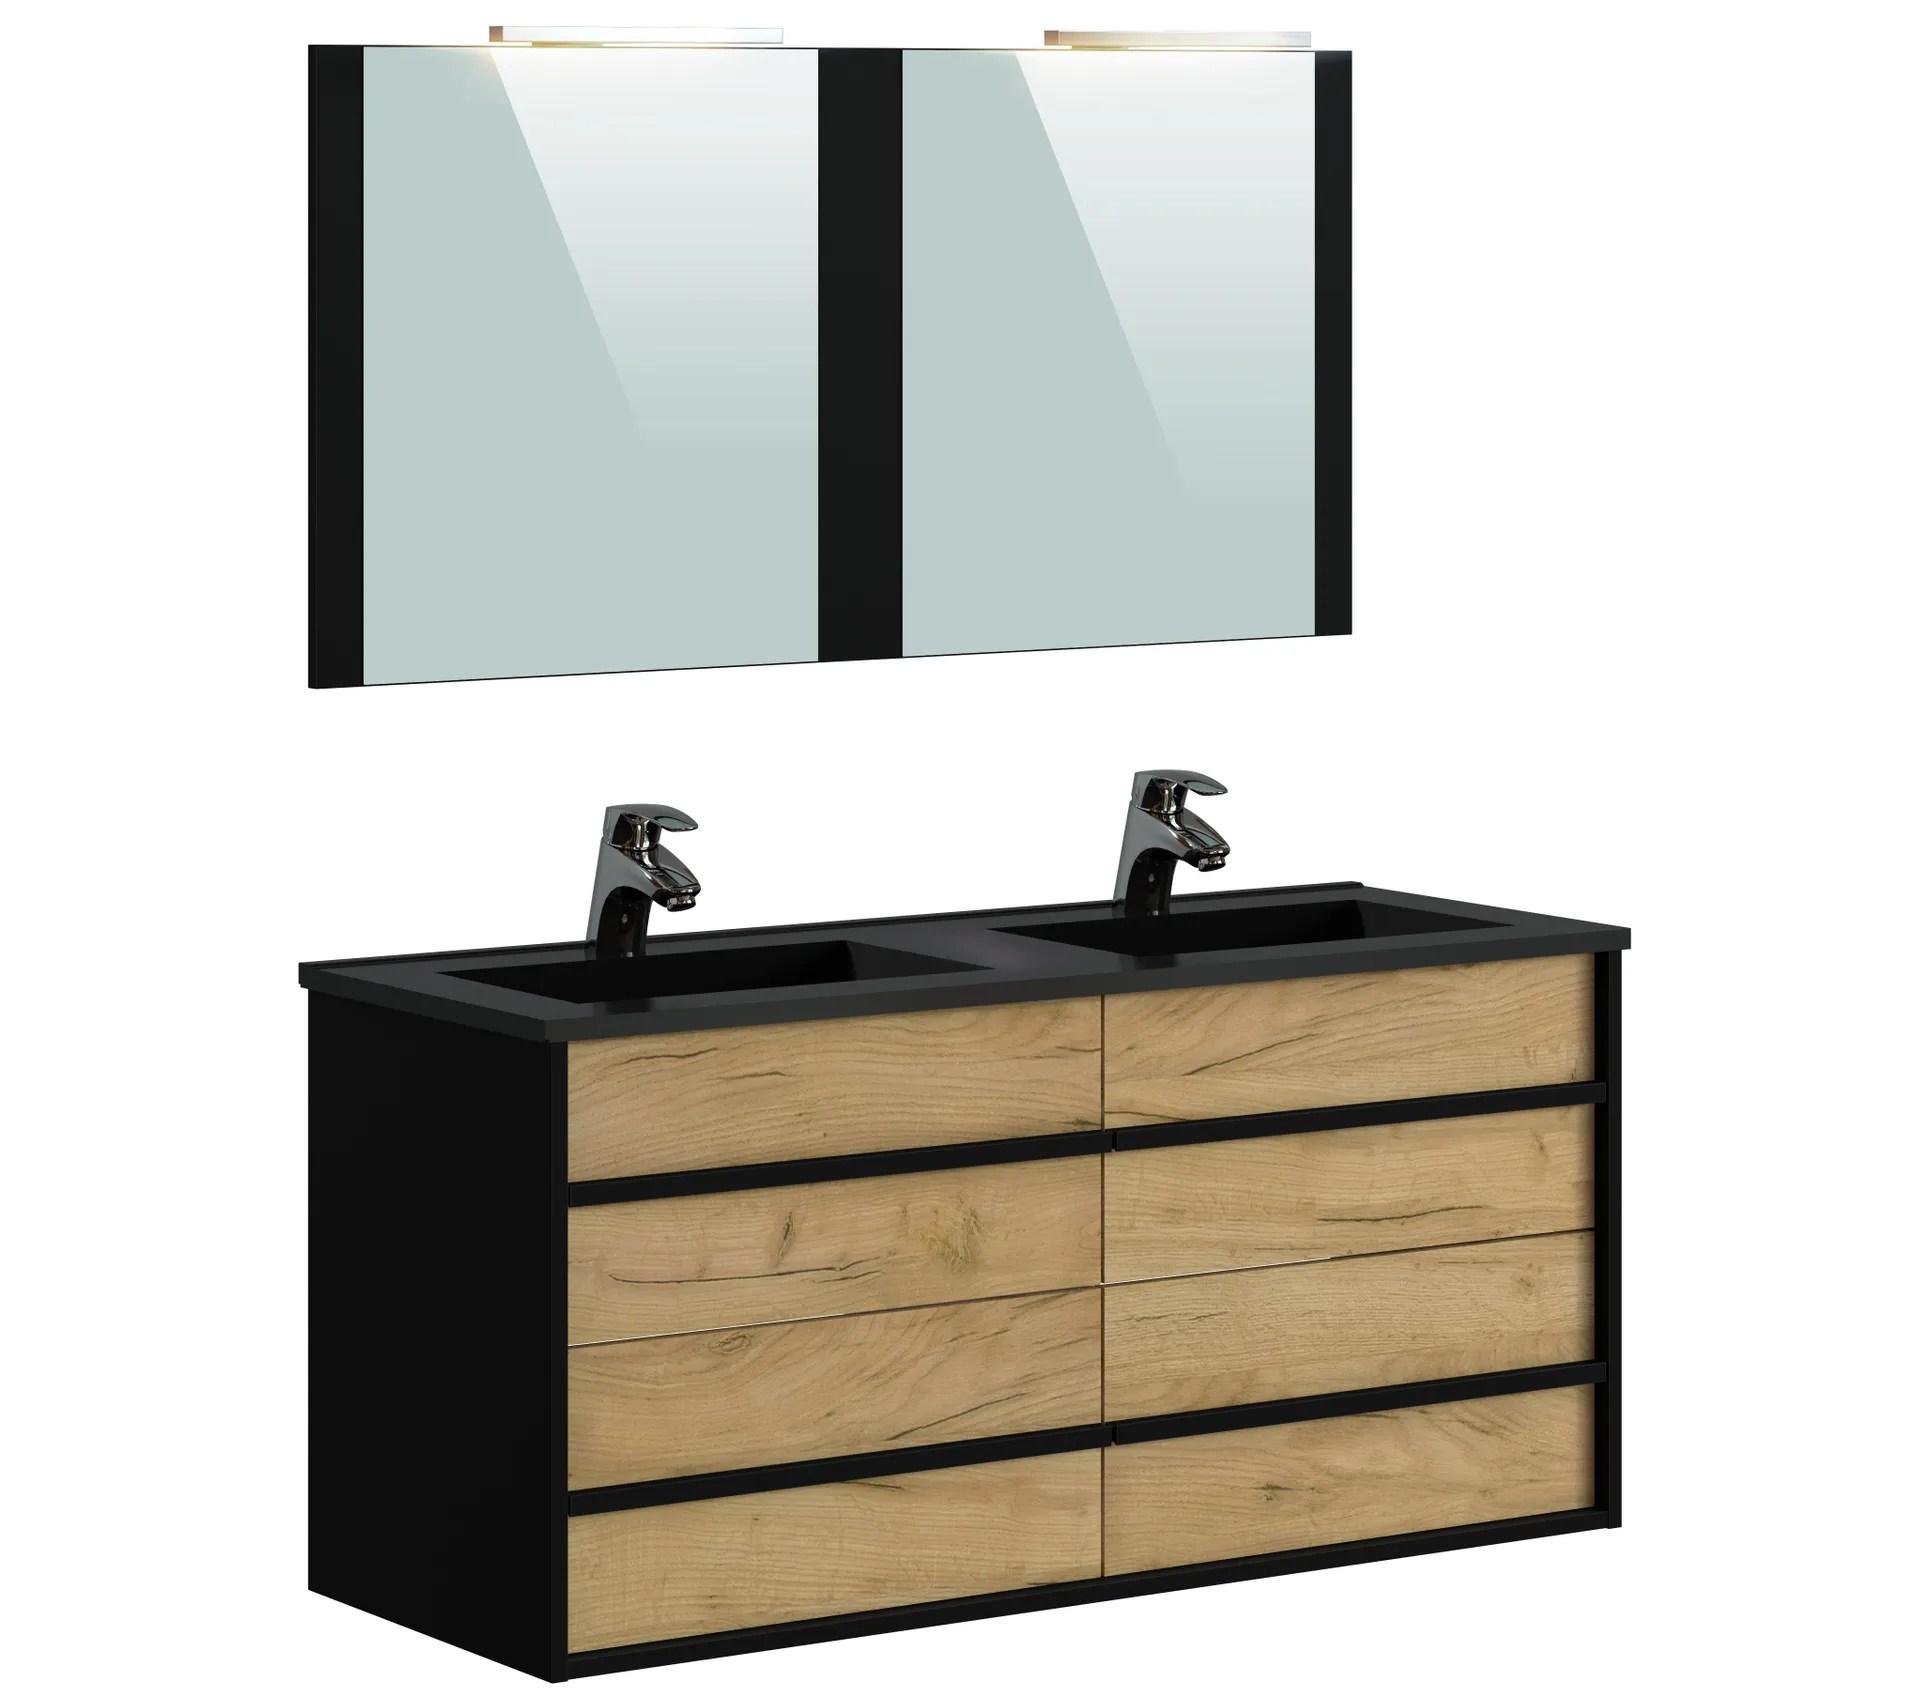 meuble de salle de bain 120 cm koh tao imitation chene brut et noir